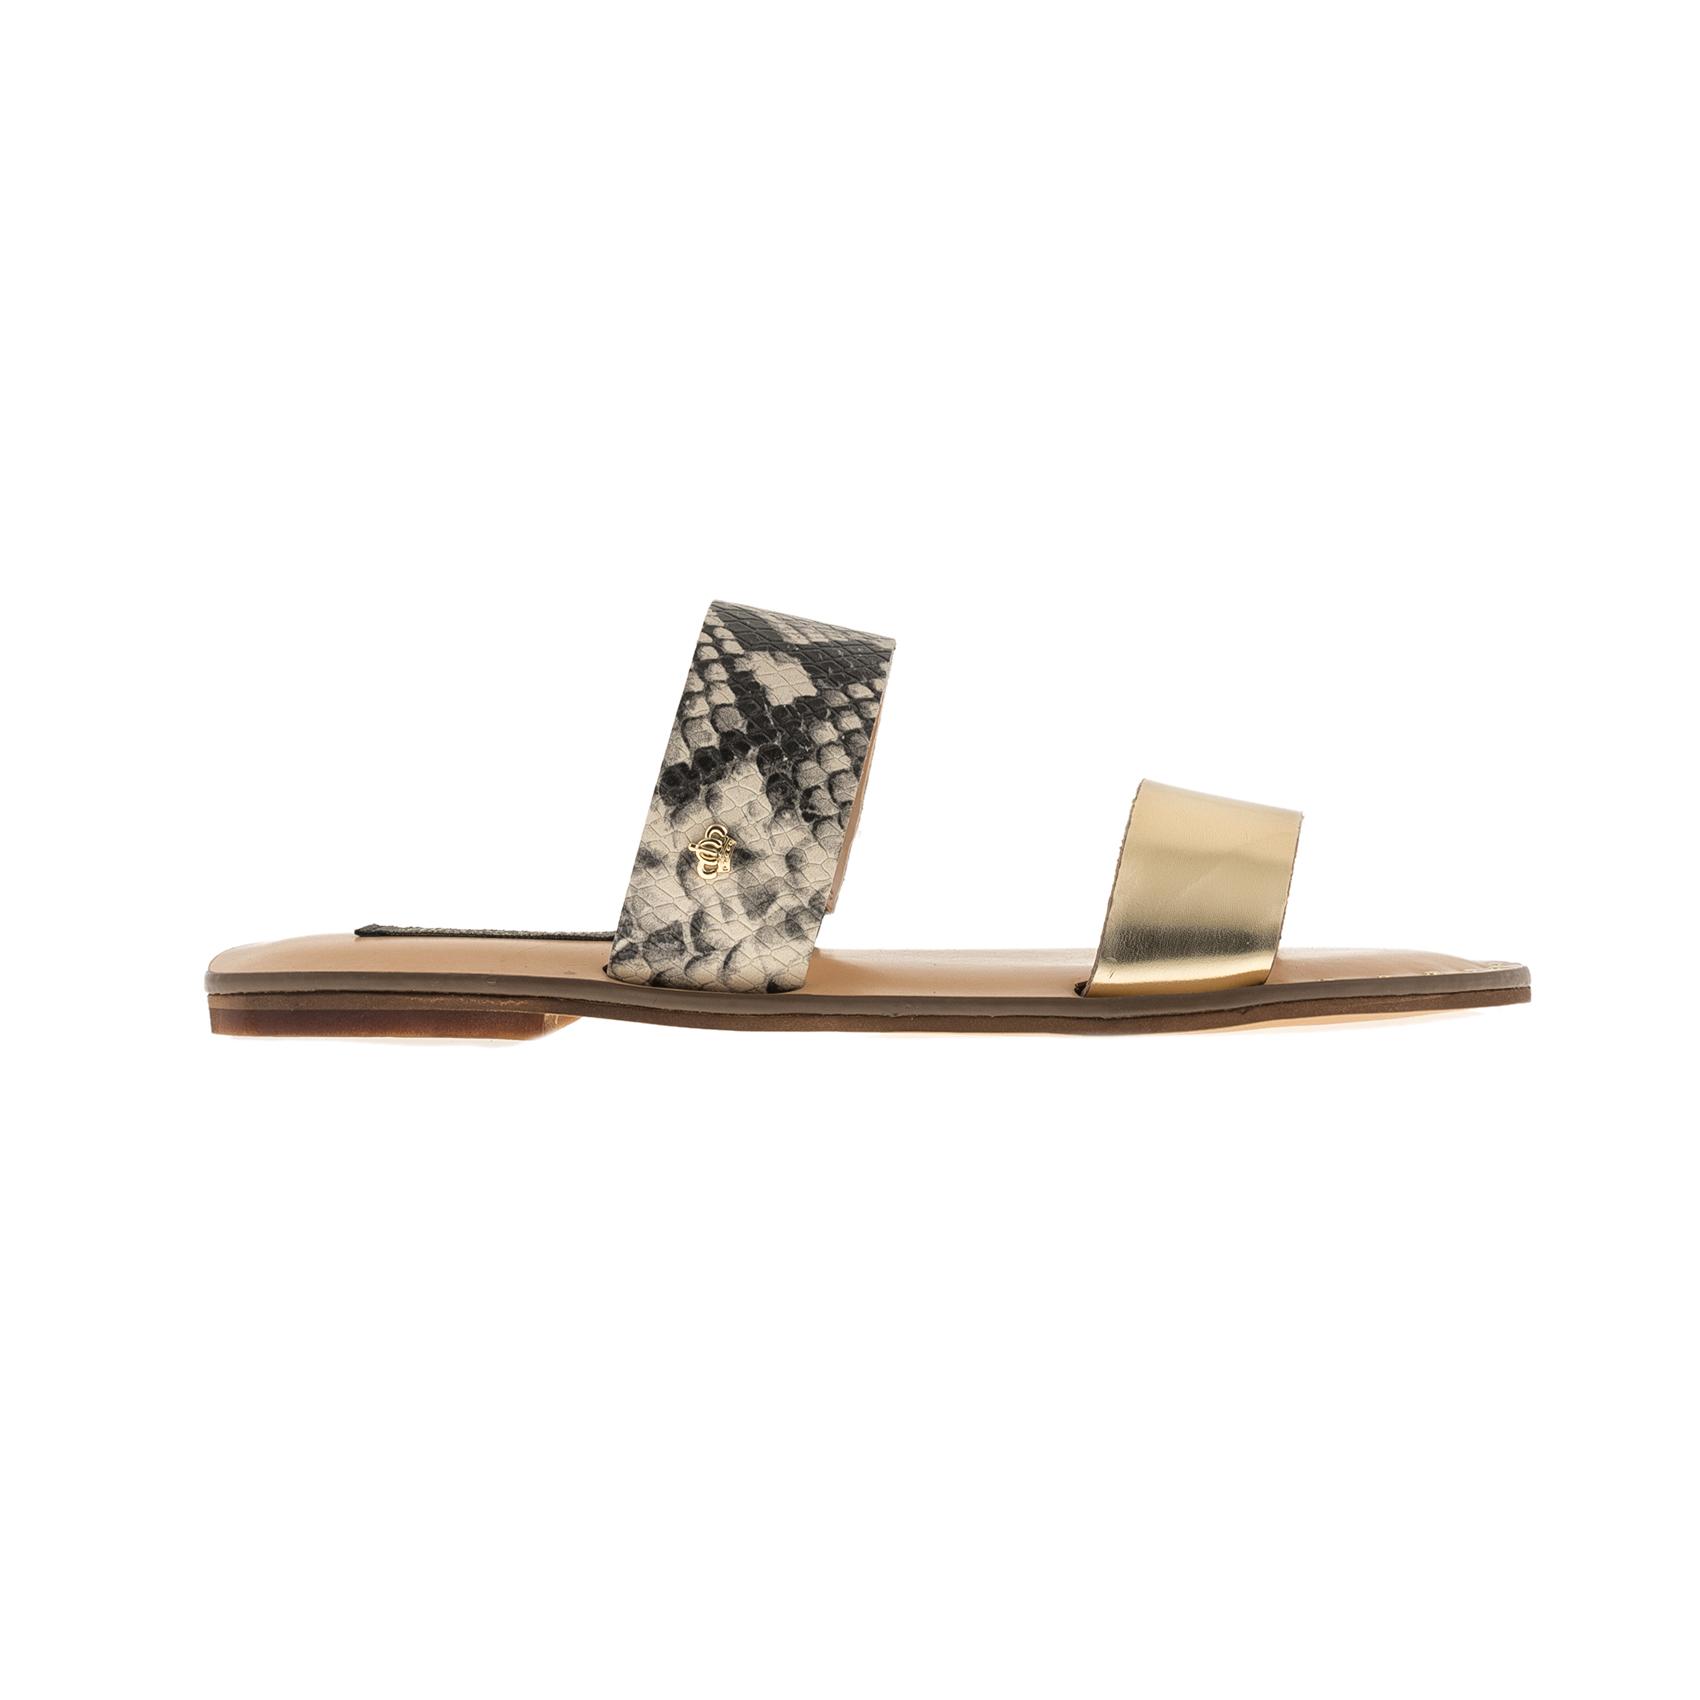 JUICY COUTURE – Γυναικεία σανδάλια JUICY COUTURE PAMI χρυσά-φίδι